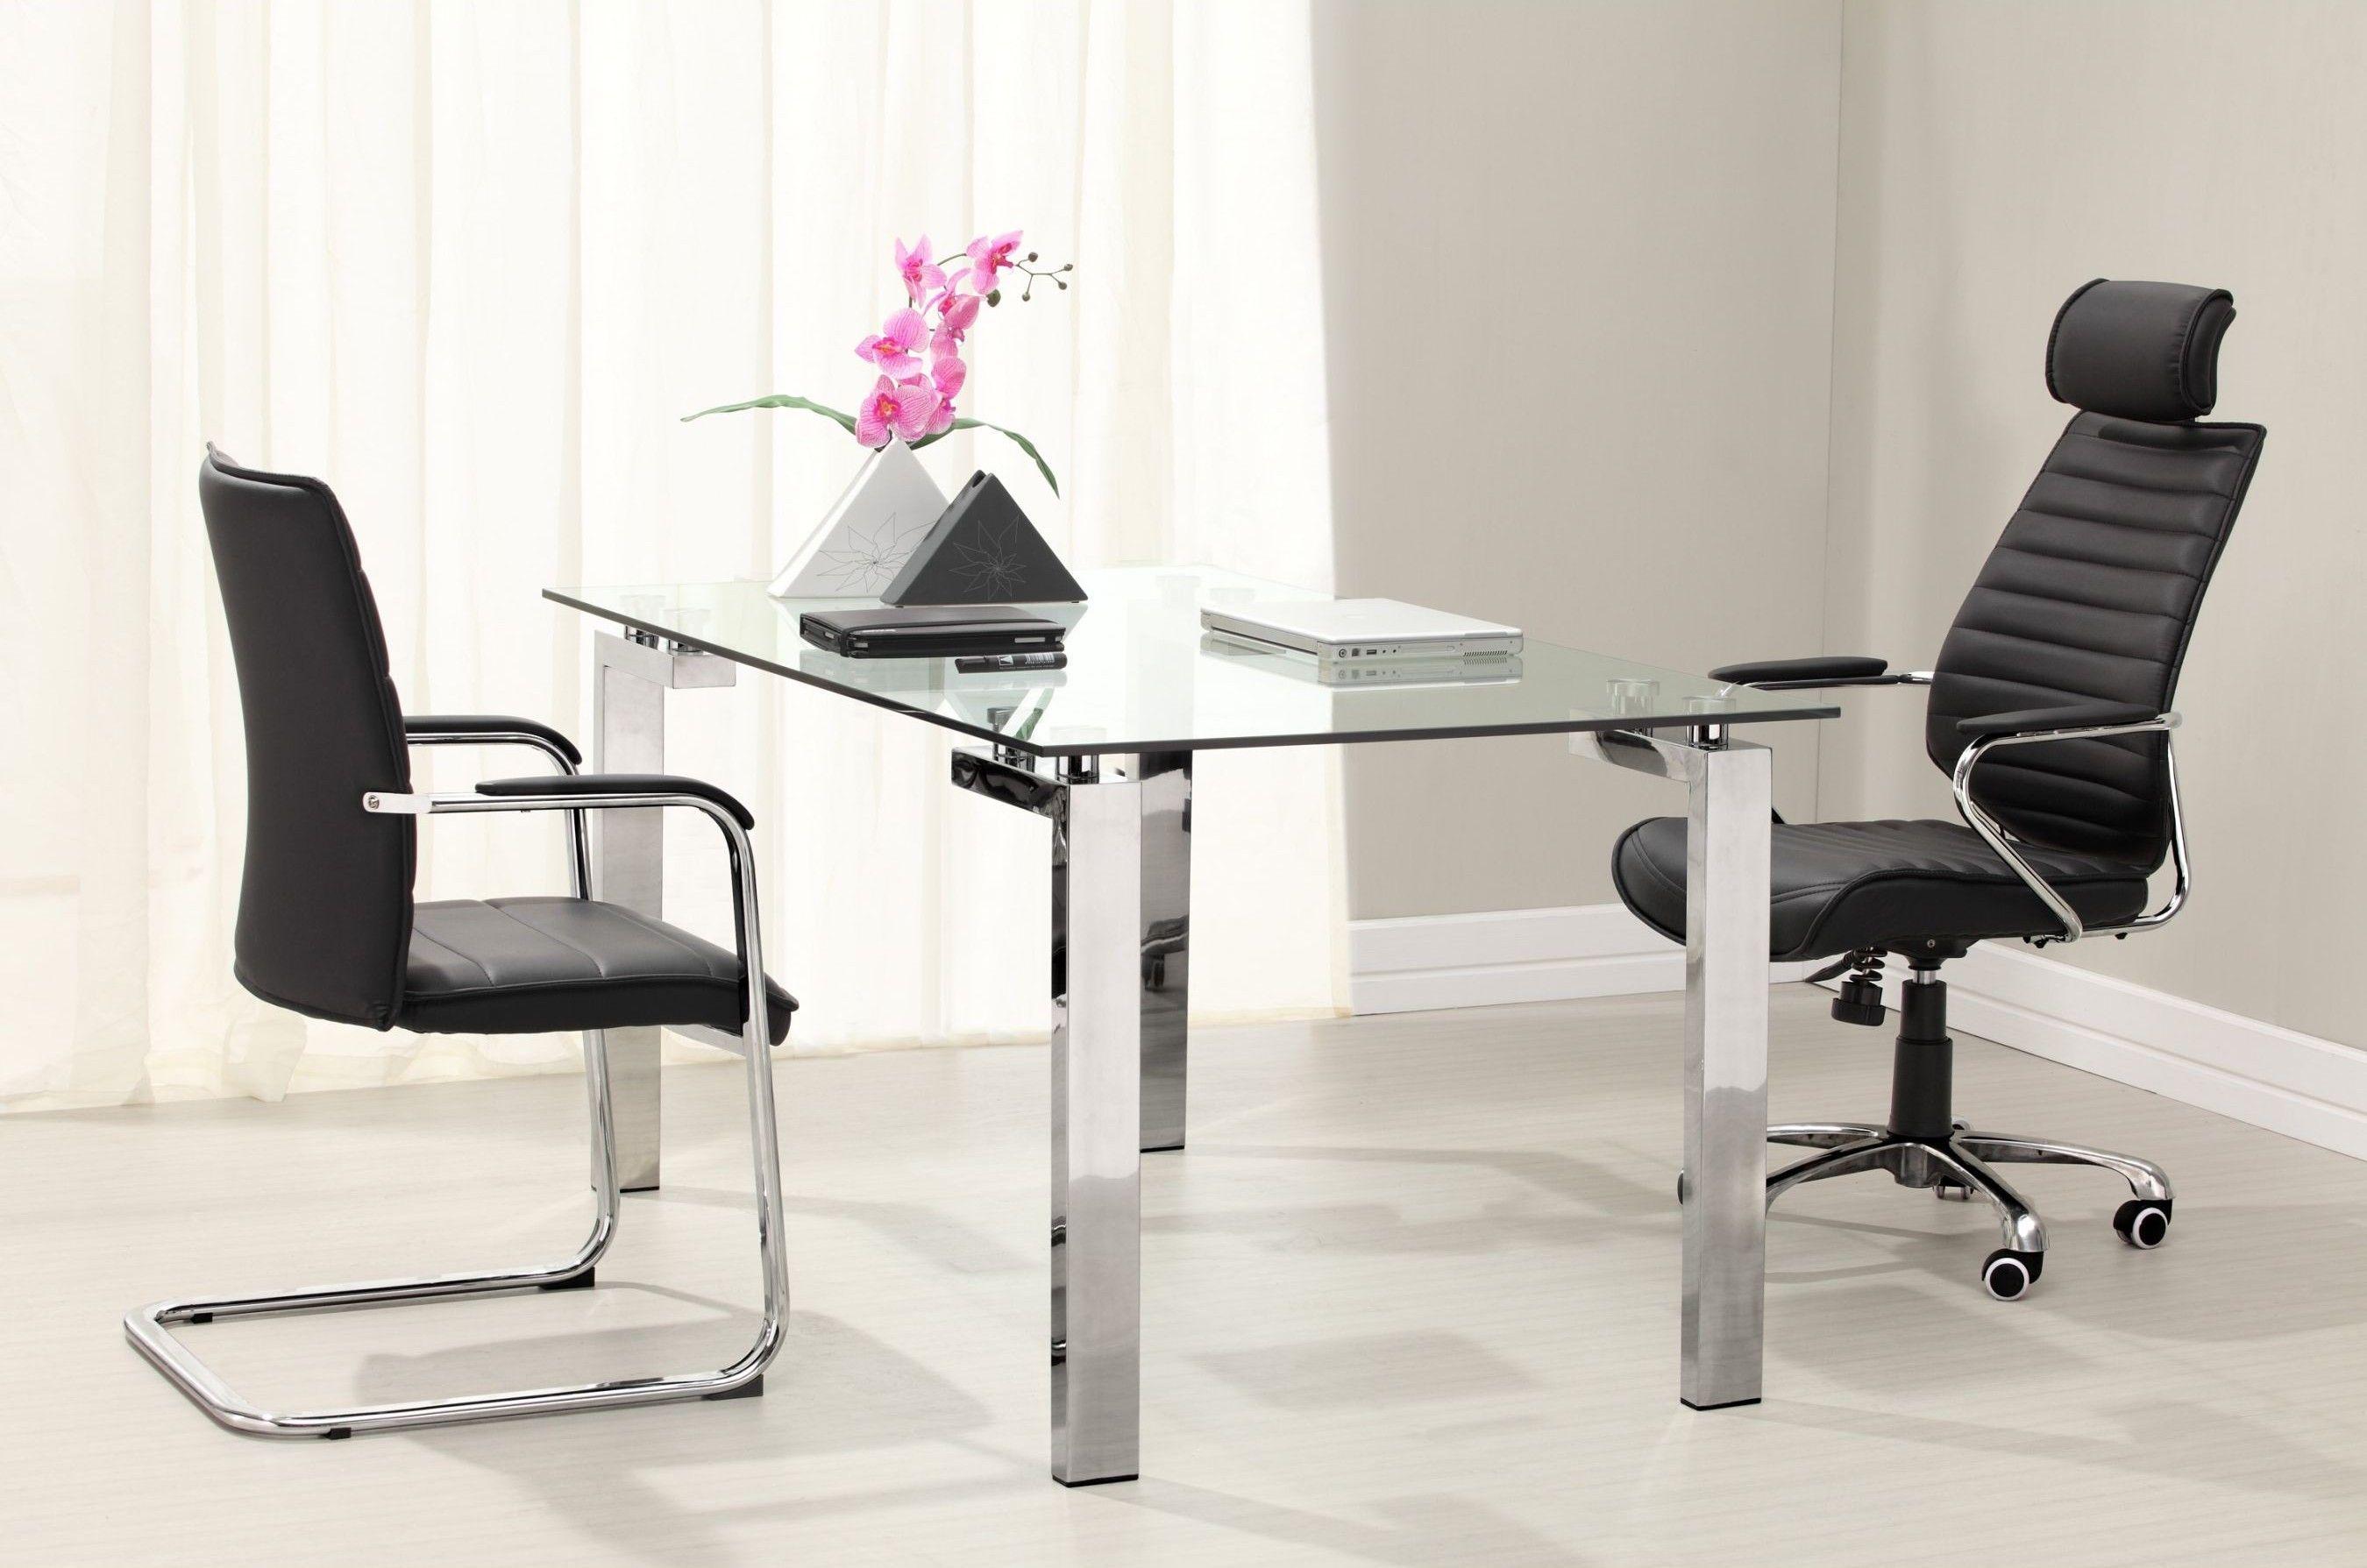 The Best Office Chair Under 200 Modern office furniture